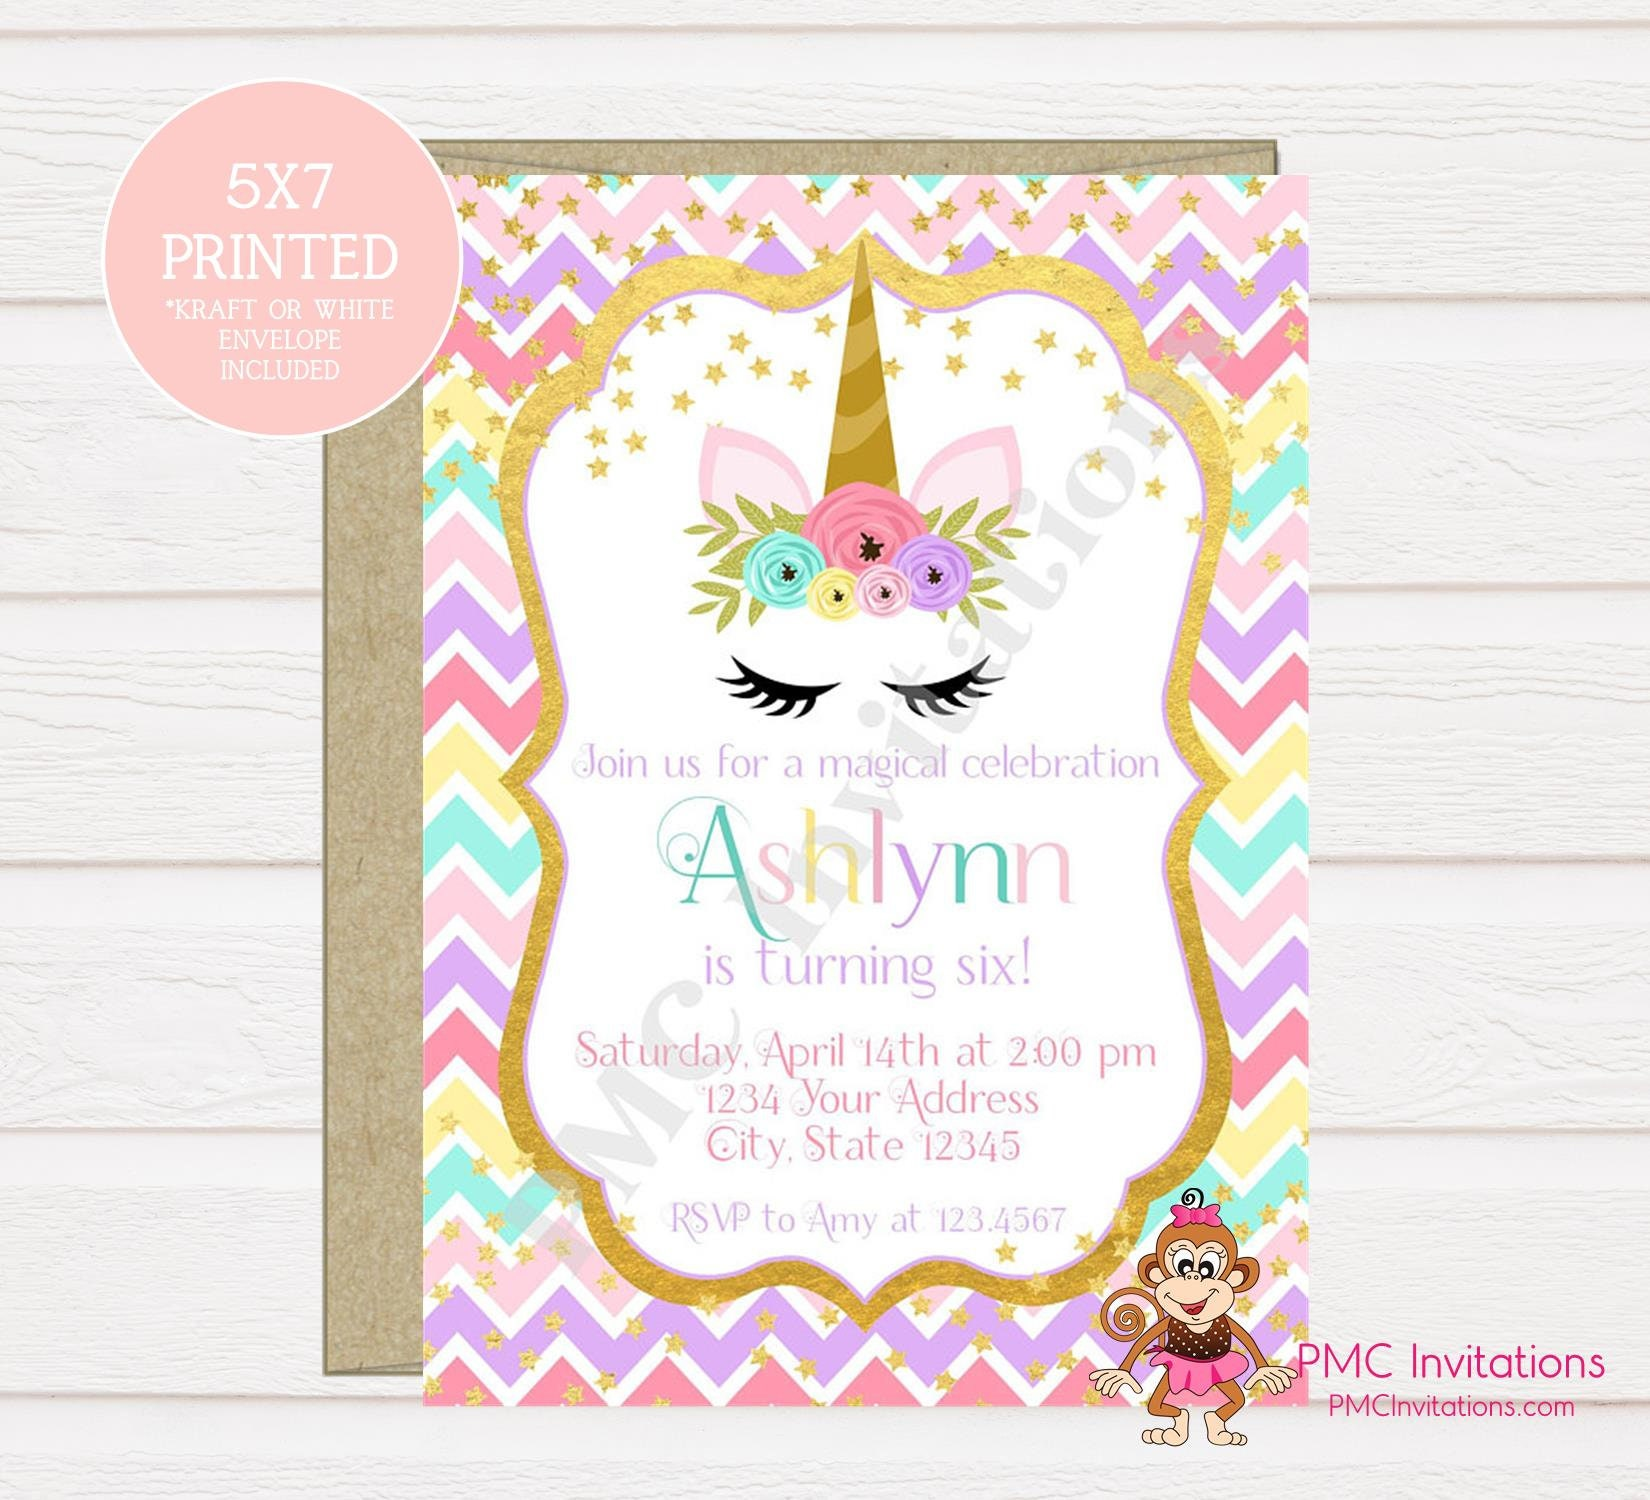 Custom Printed Unicorn Birthday Invitation Unicorn Face Etsy